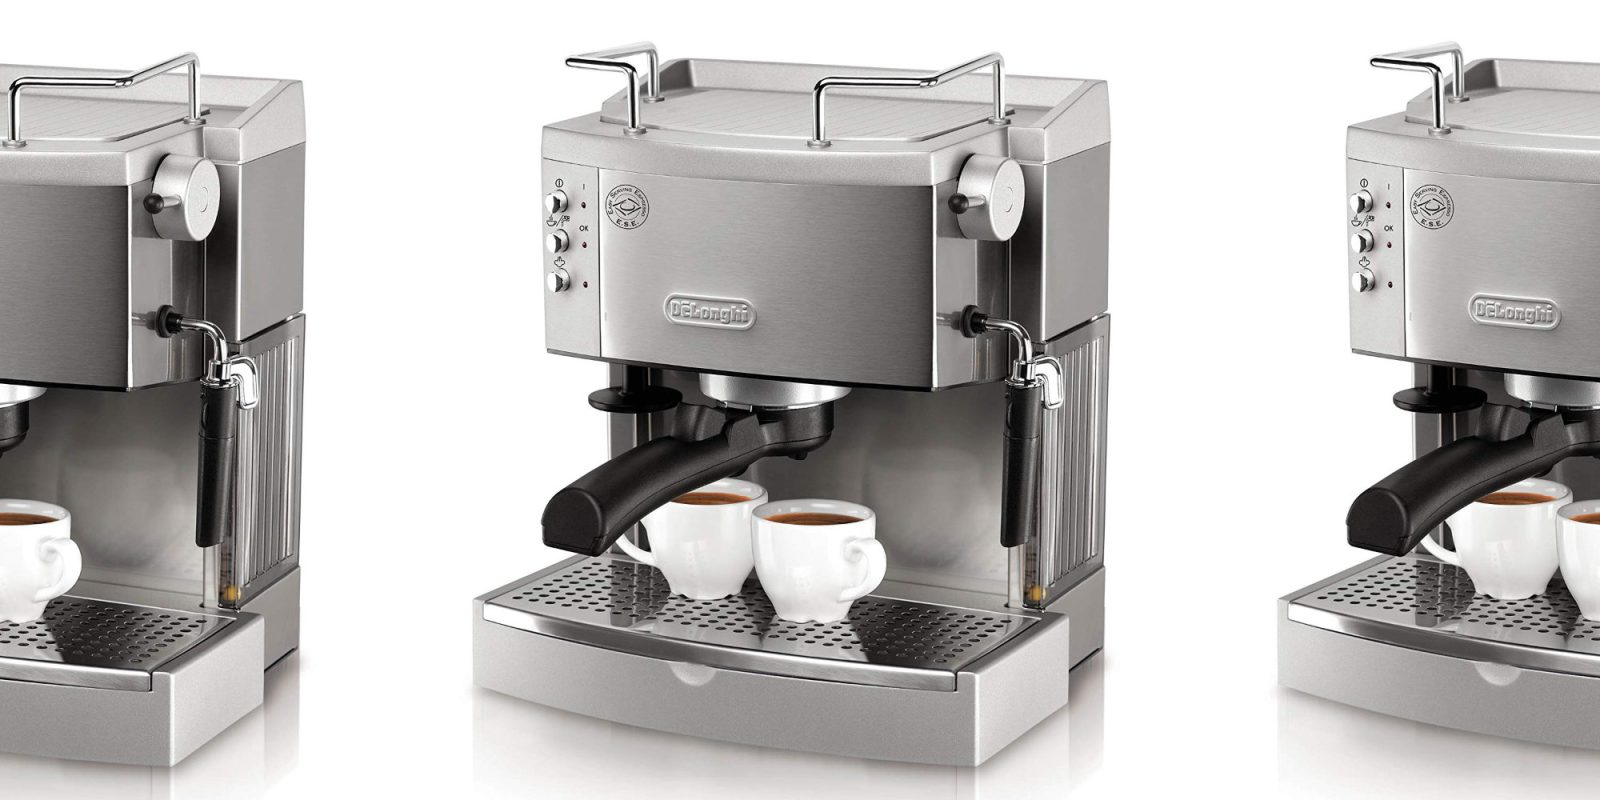 DeLonghi's stainless steel 15-Bar Pump Espresso Maker hits $144 (Reg. $180)